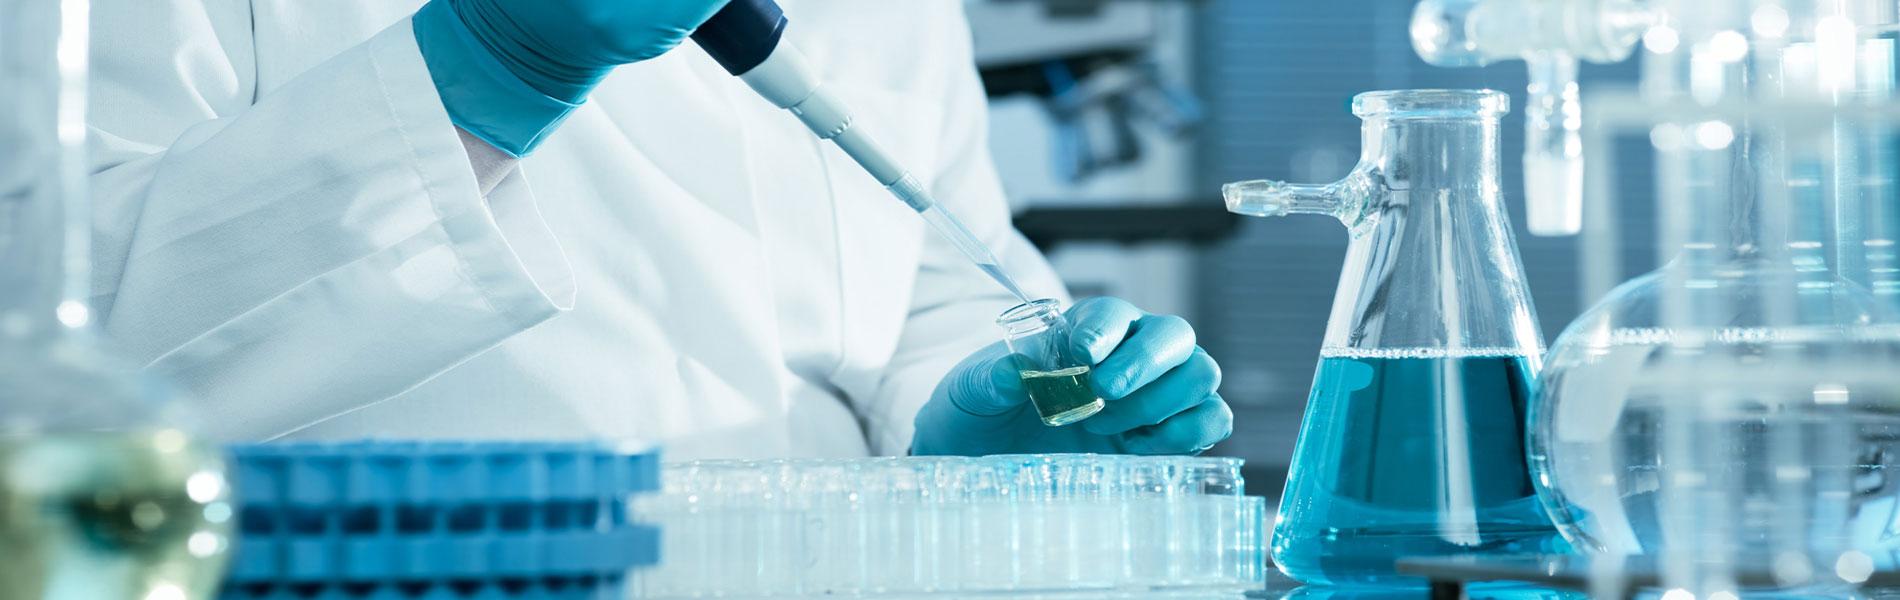 BGI's Fully Equipped Laboratory